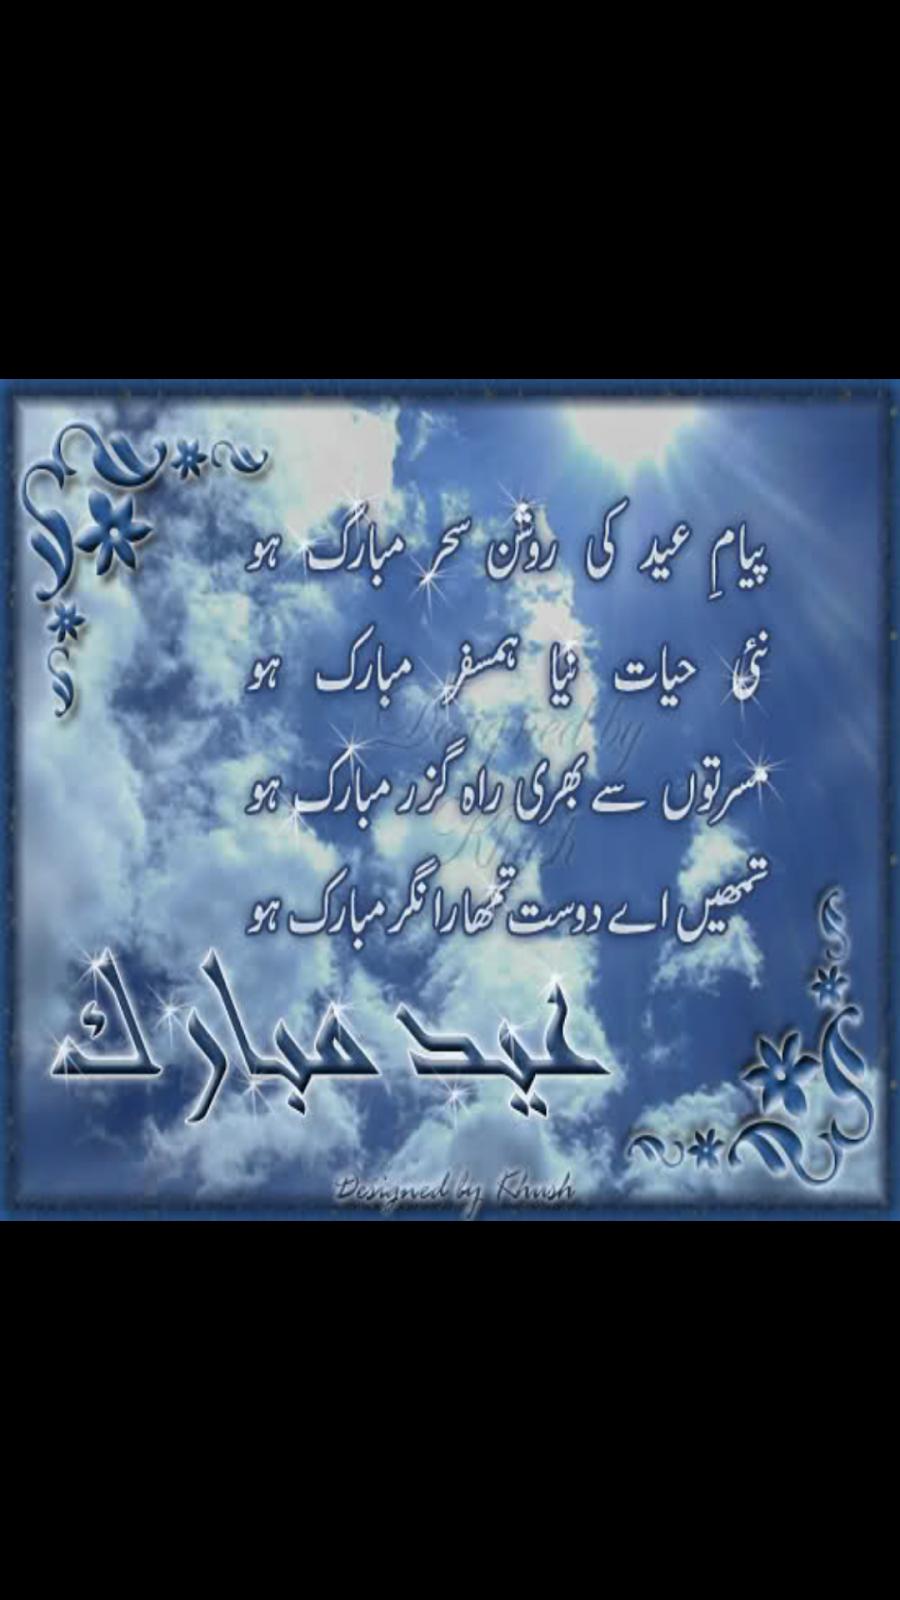 Payam E Eid Ki Roshan Sehr Mubarak Ho Urdu Eid Mubarak Poetry